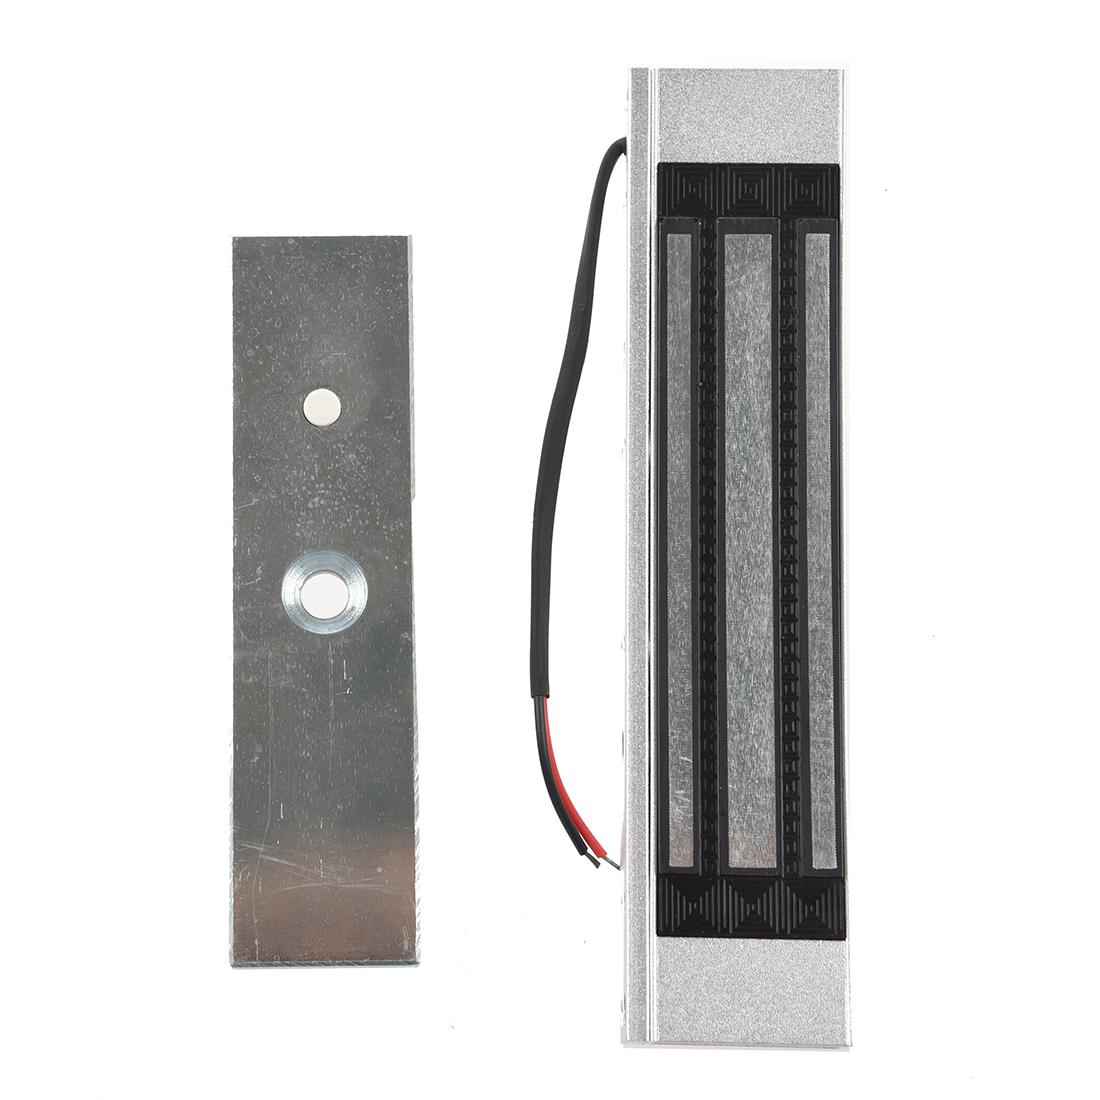 Ks single door 12v electric magnetic electromagnetic lock for 12v magnetic door lock